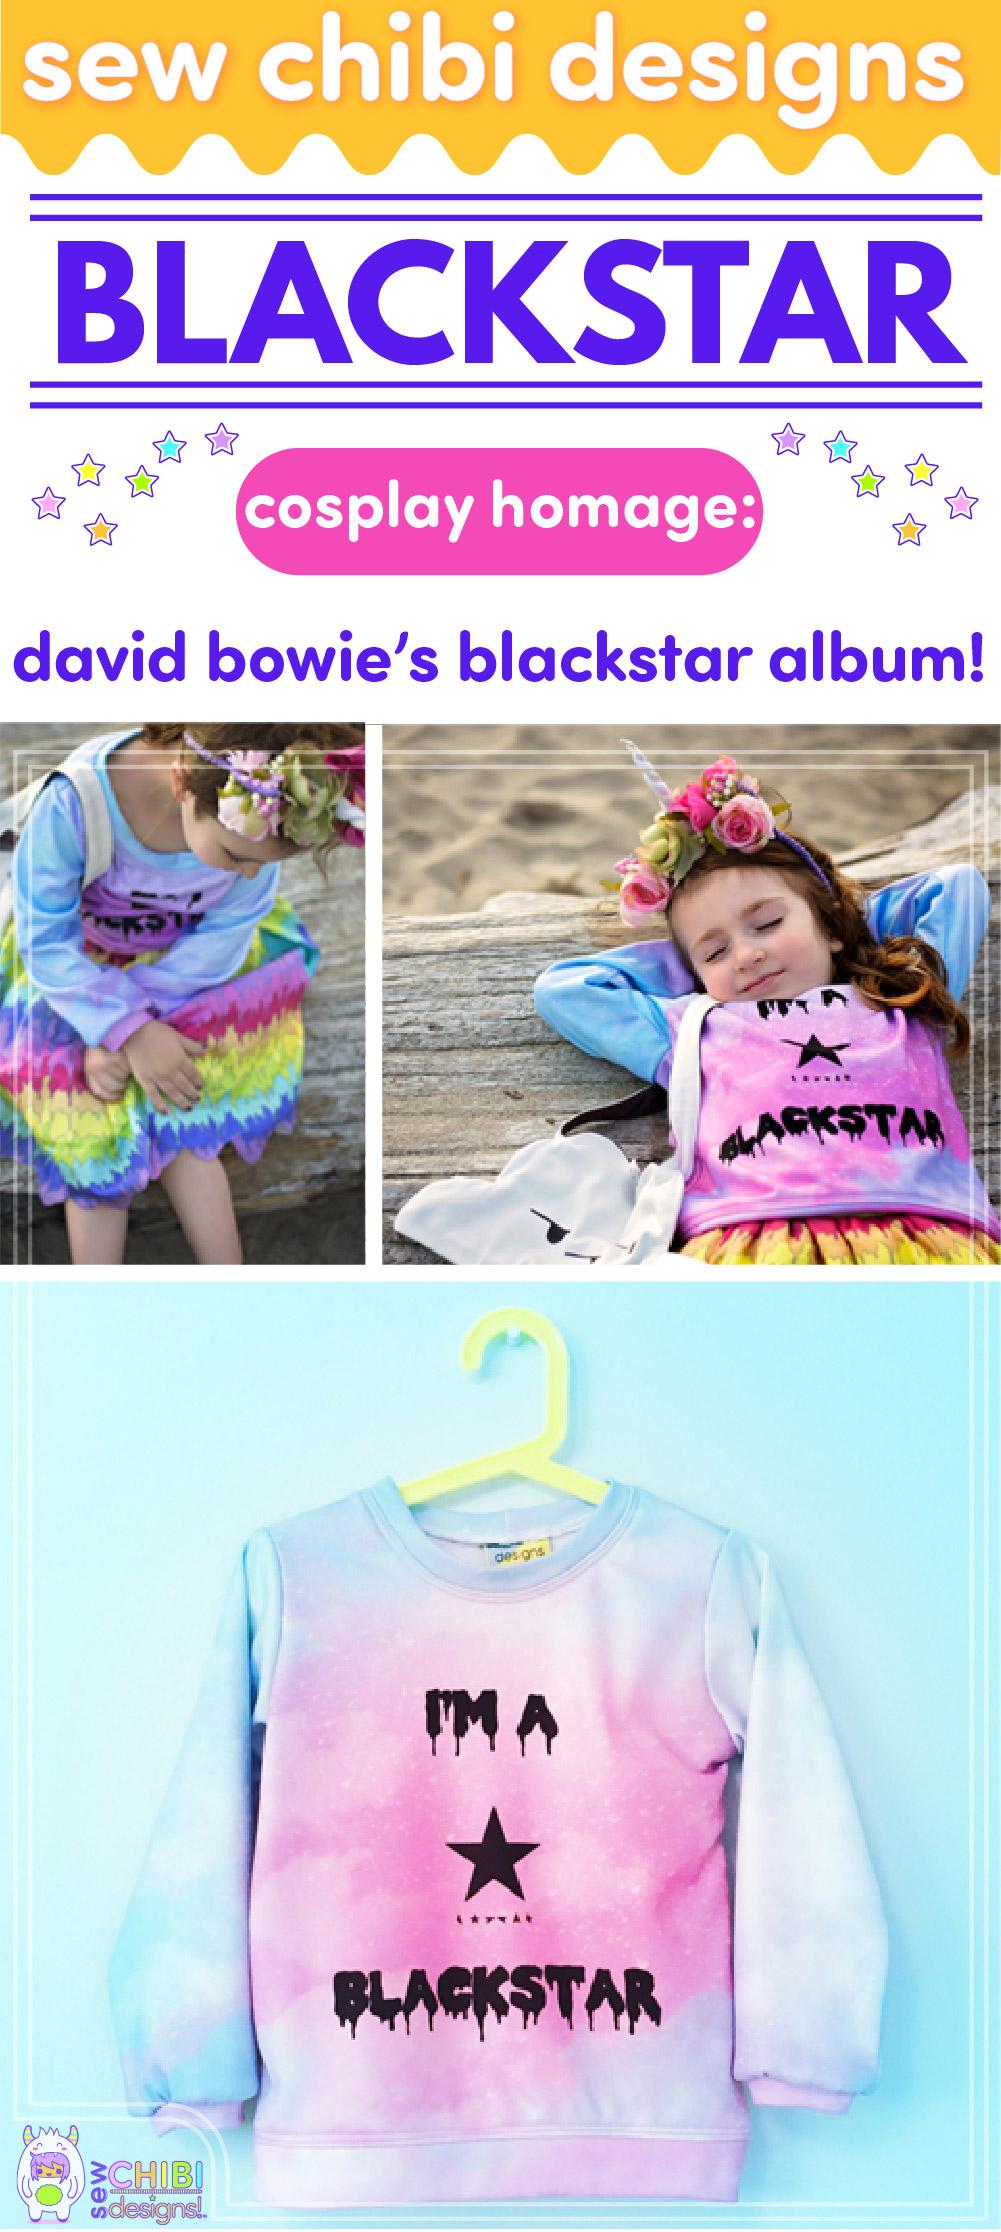 David Bowie Blackstar pastel goth and rainbows chibi cosplay sewn by Sew Chibi Designs for Sew Geeky